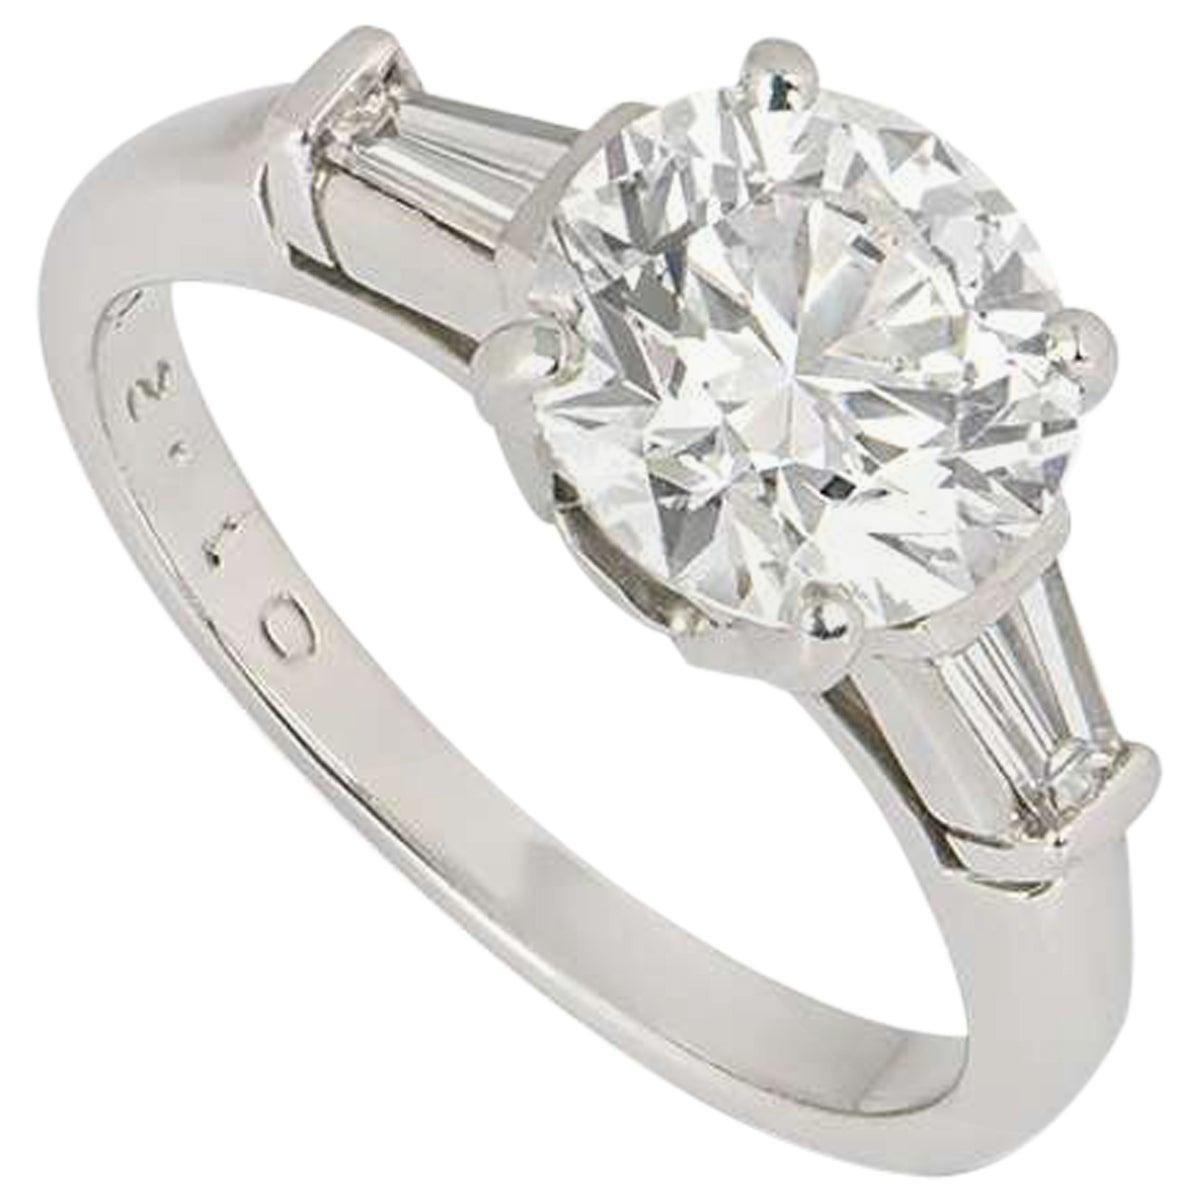 Tiffany & Co. Three-Stone Engagement Ring 2.10 Carat E/VS1